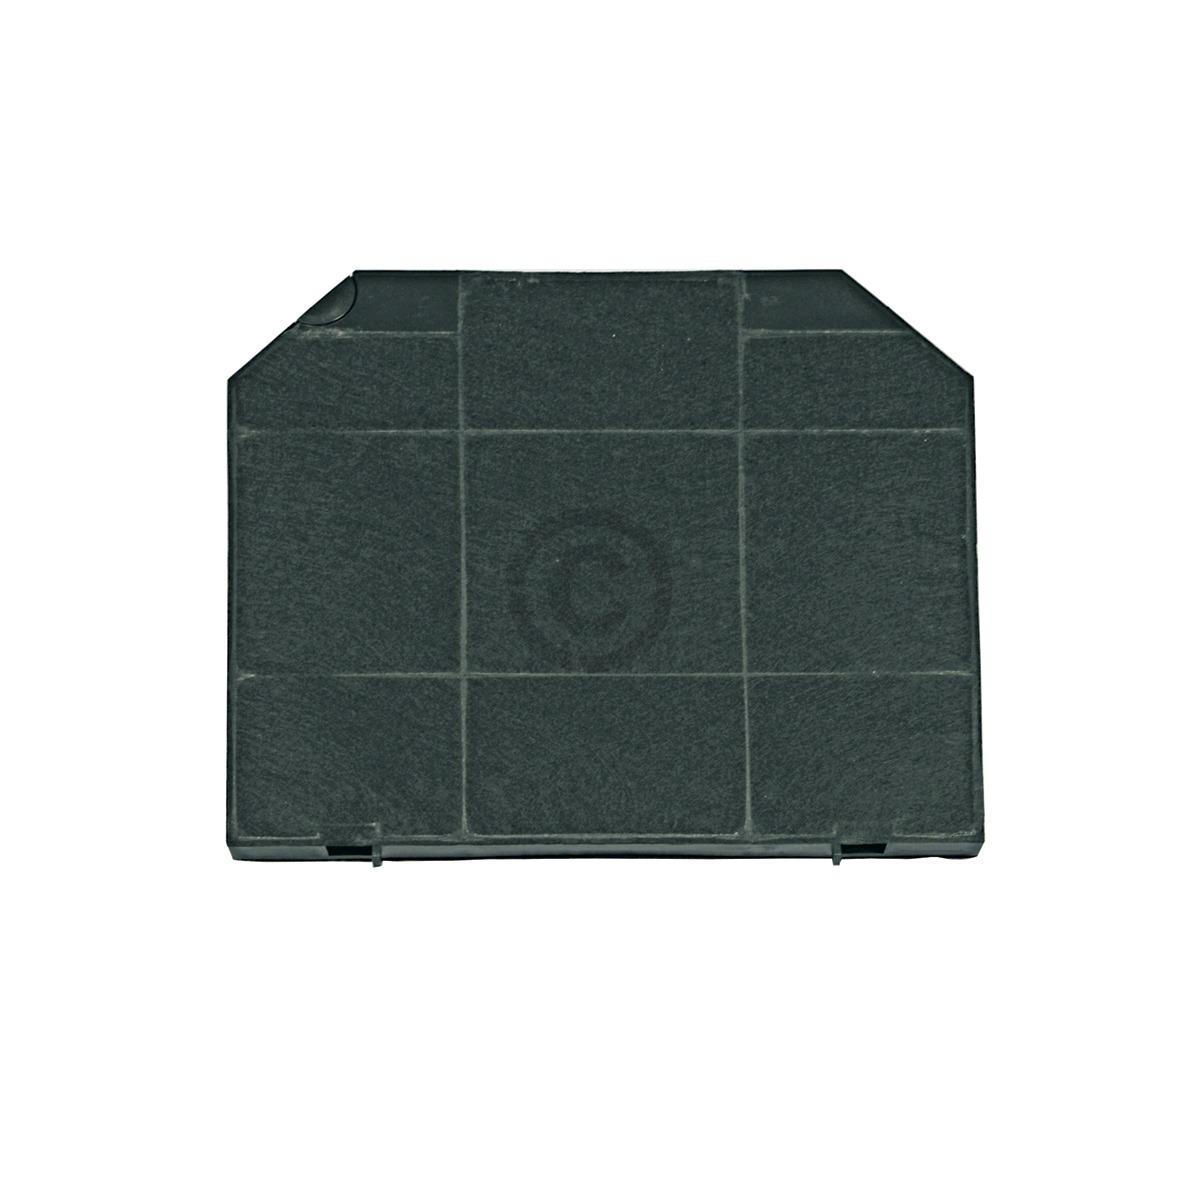 Kohlefilter 264x235mm, AT! 902979363 AEG, Electrolux, Juno, Zanussi, Electrolux